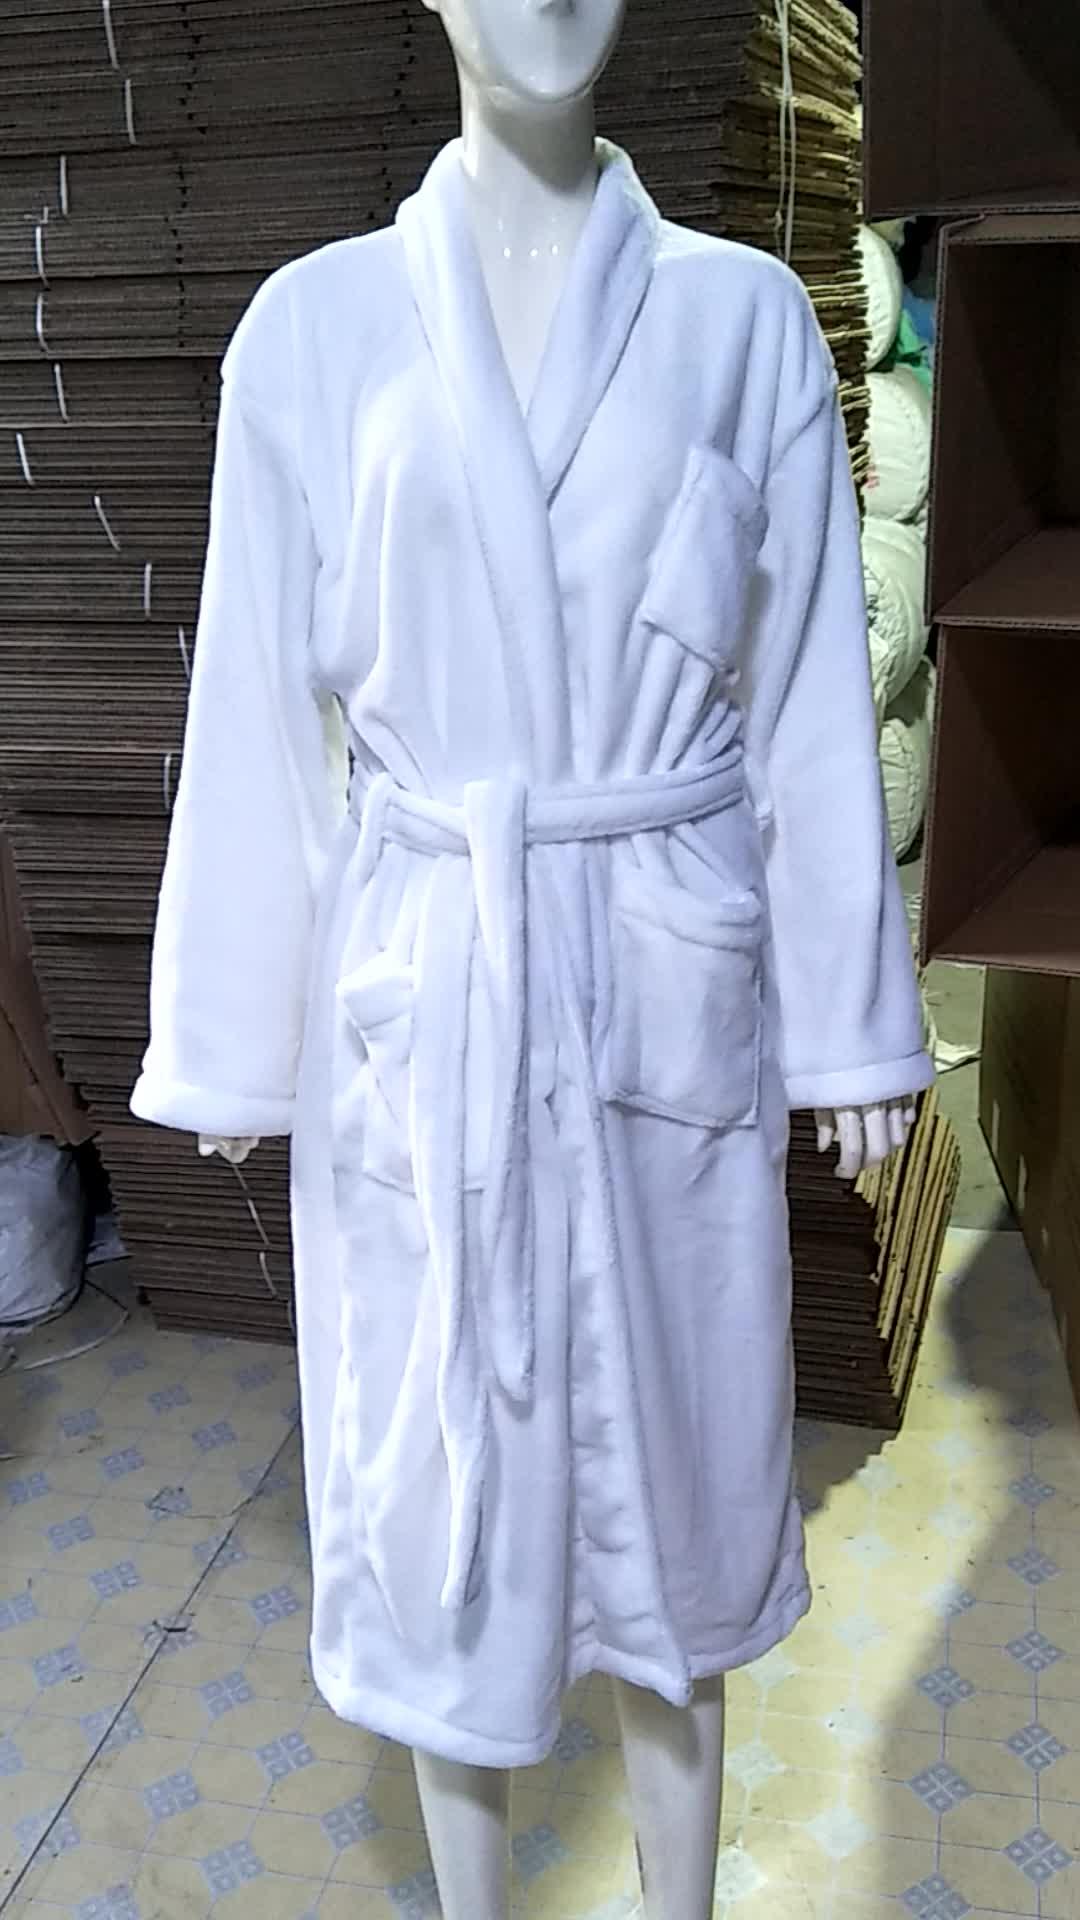 Mens '5 star hotel badjas goedkope kimono badjas